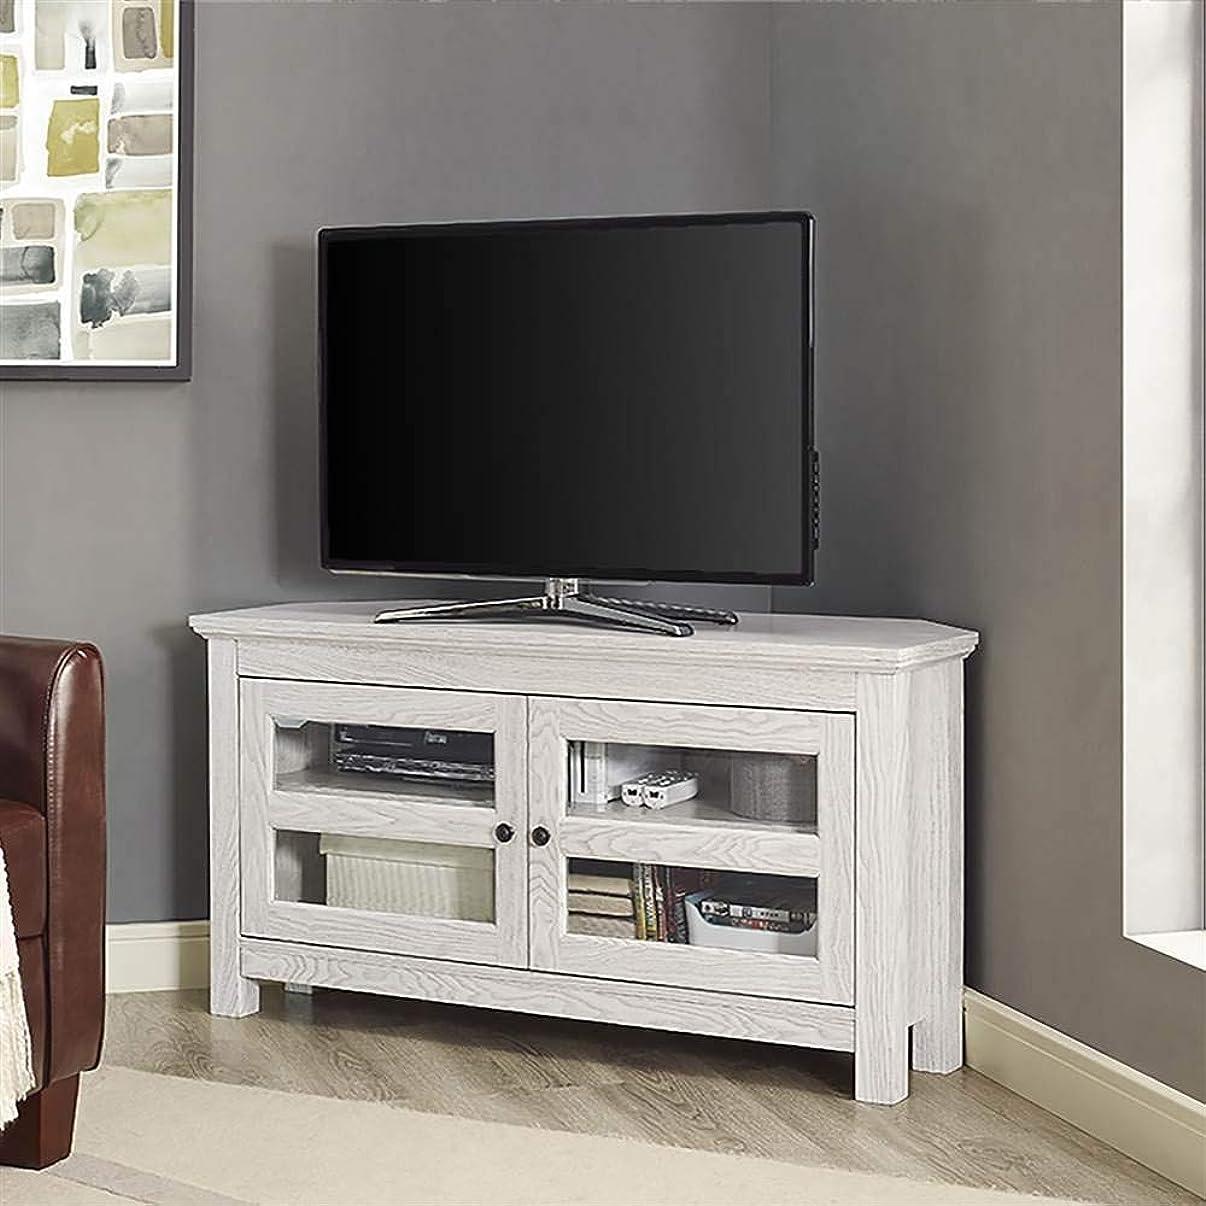 WE Furniture AZQ44CCRWW TV Stand, 44